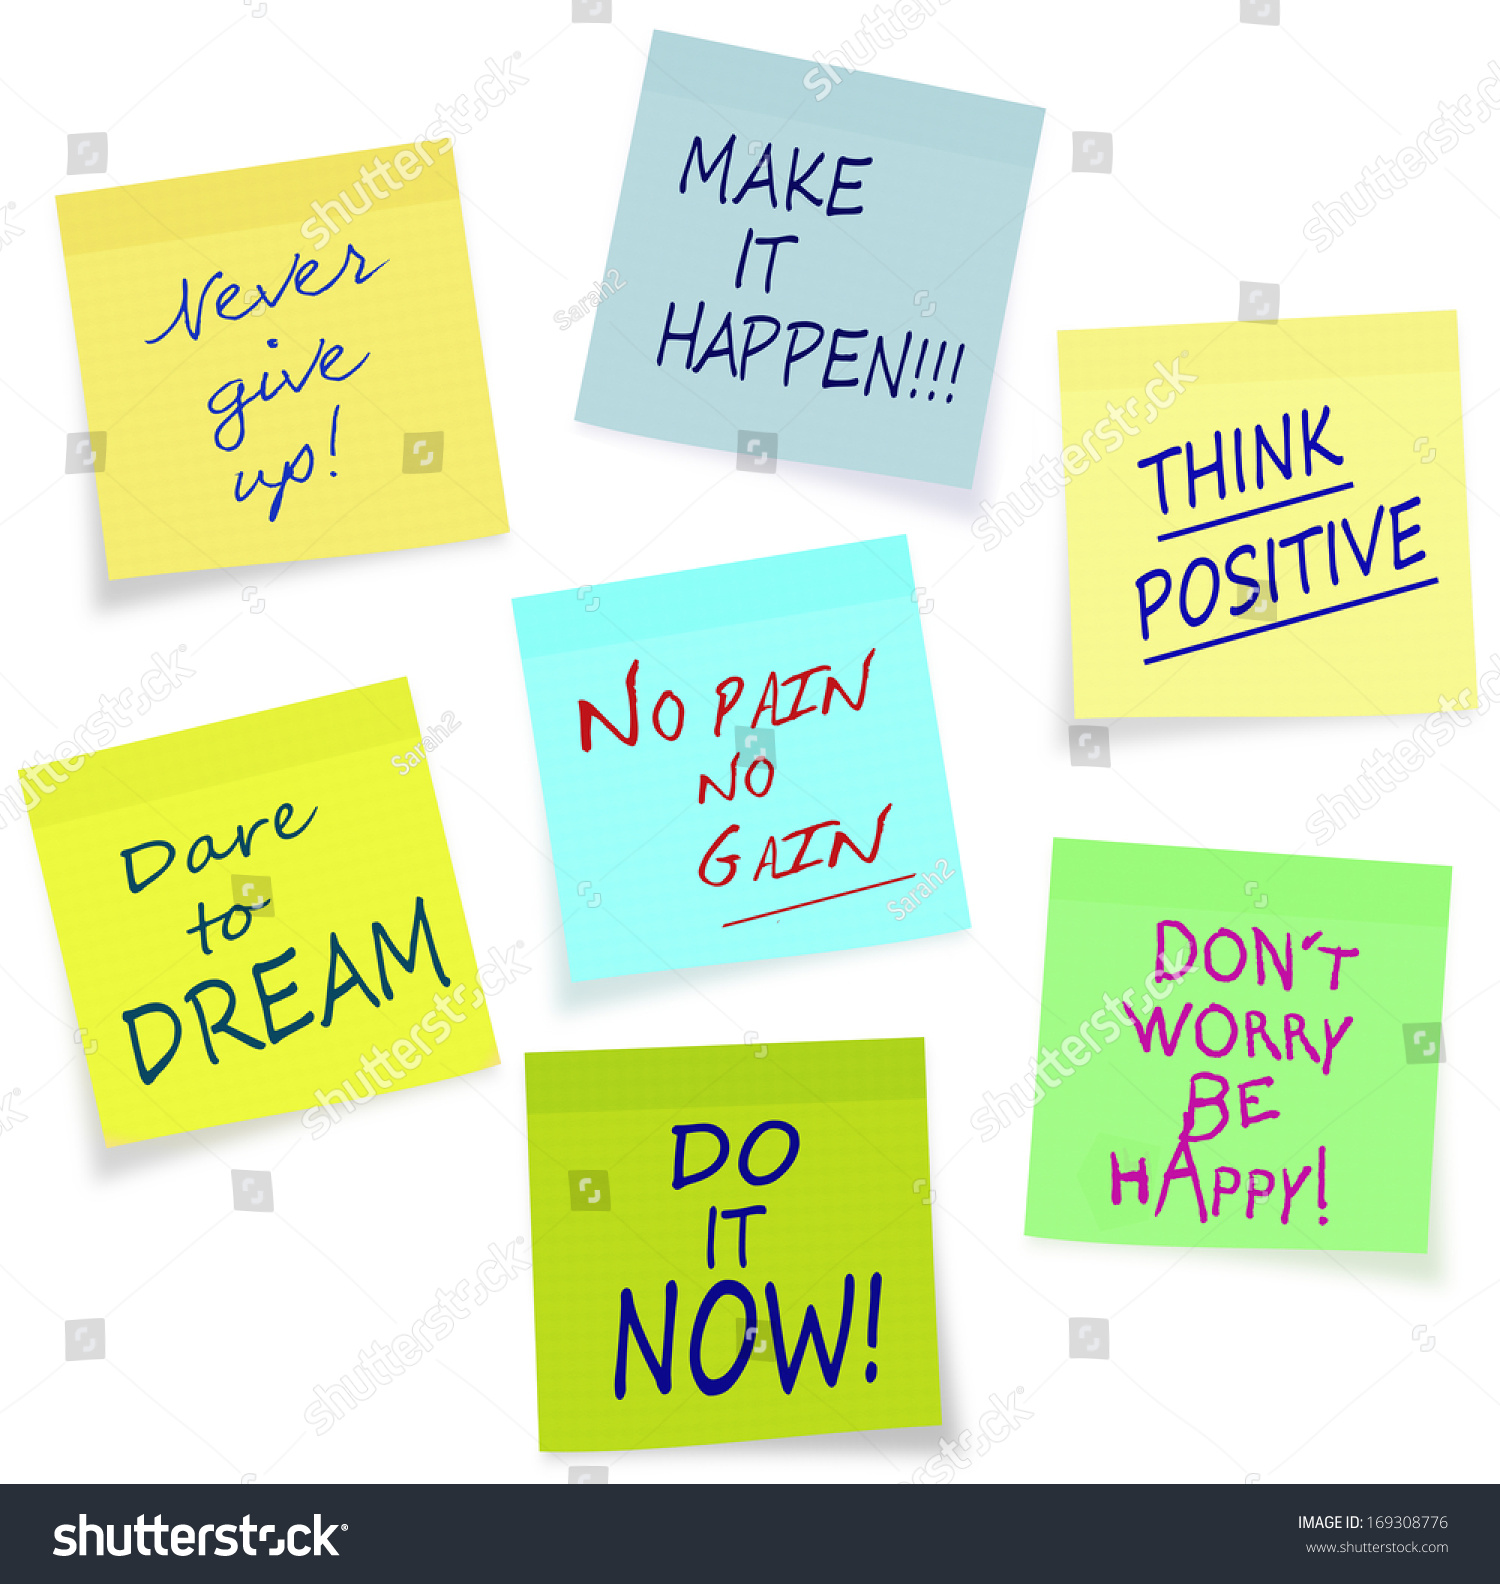 Positive Motivation Messages On Sticky Notes Stock ...